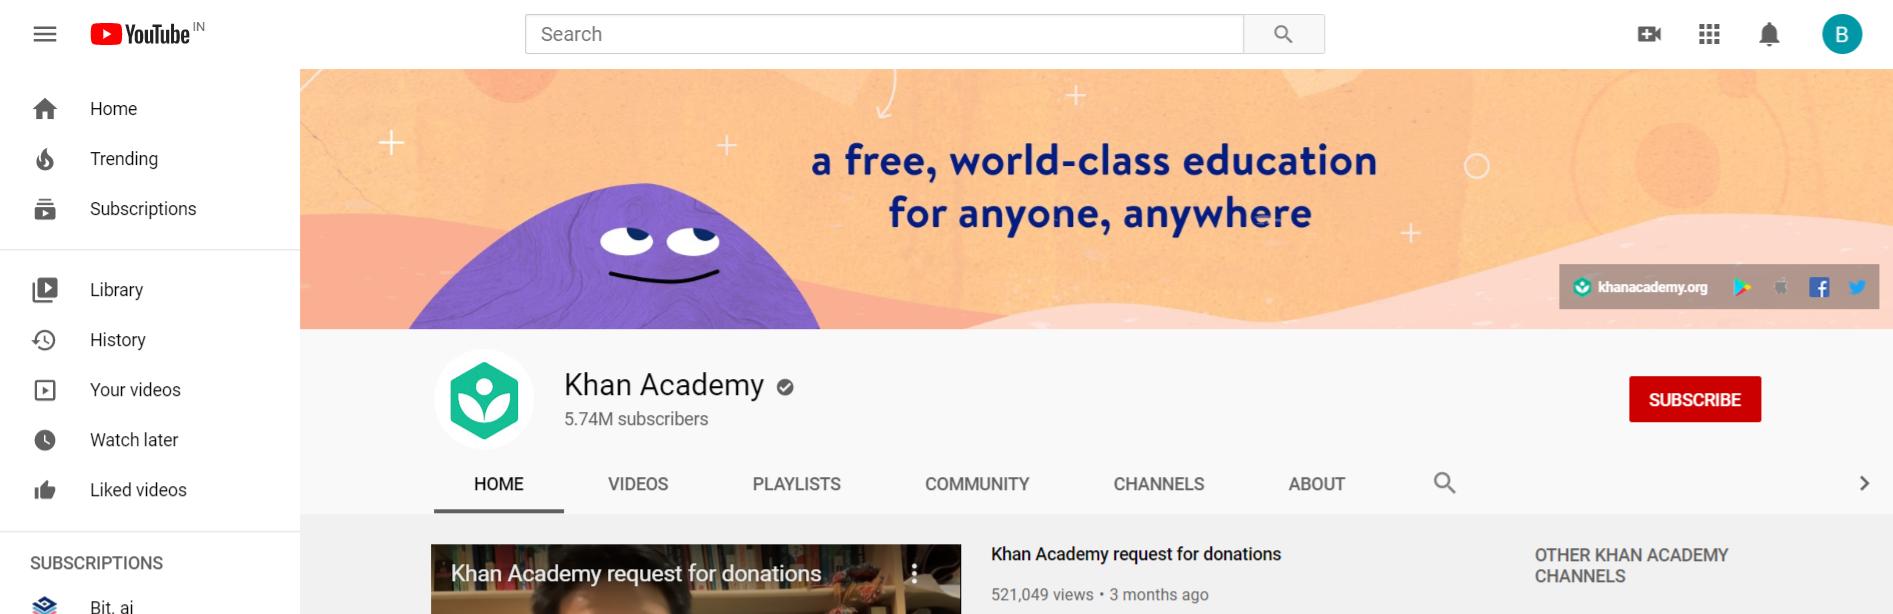 Khan academy: Edtech youtube channel